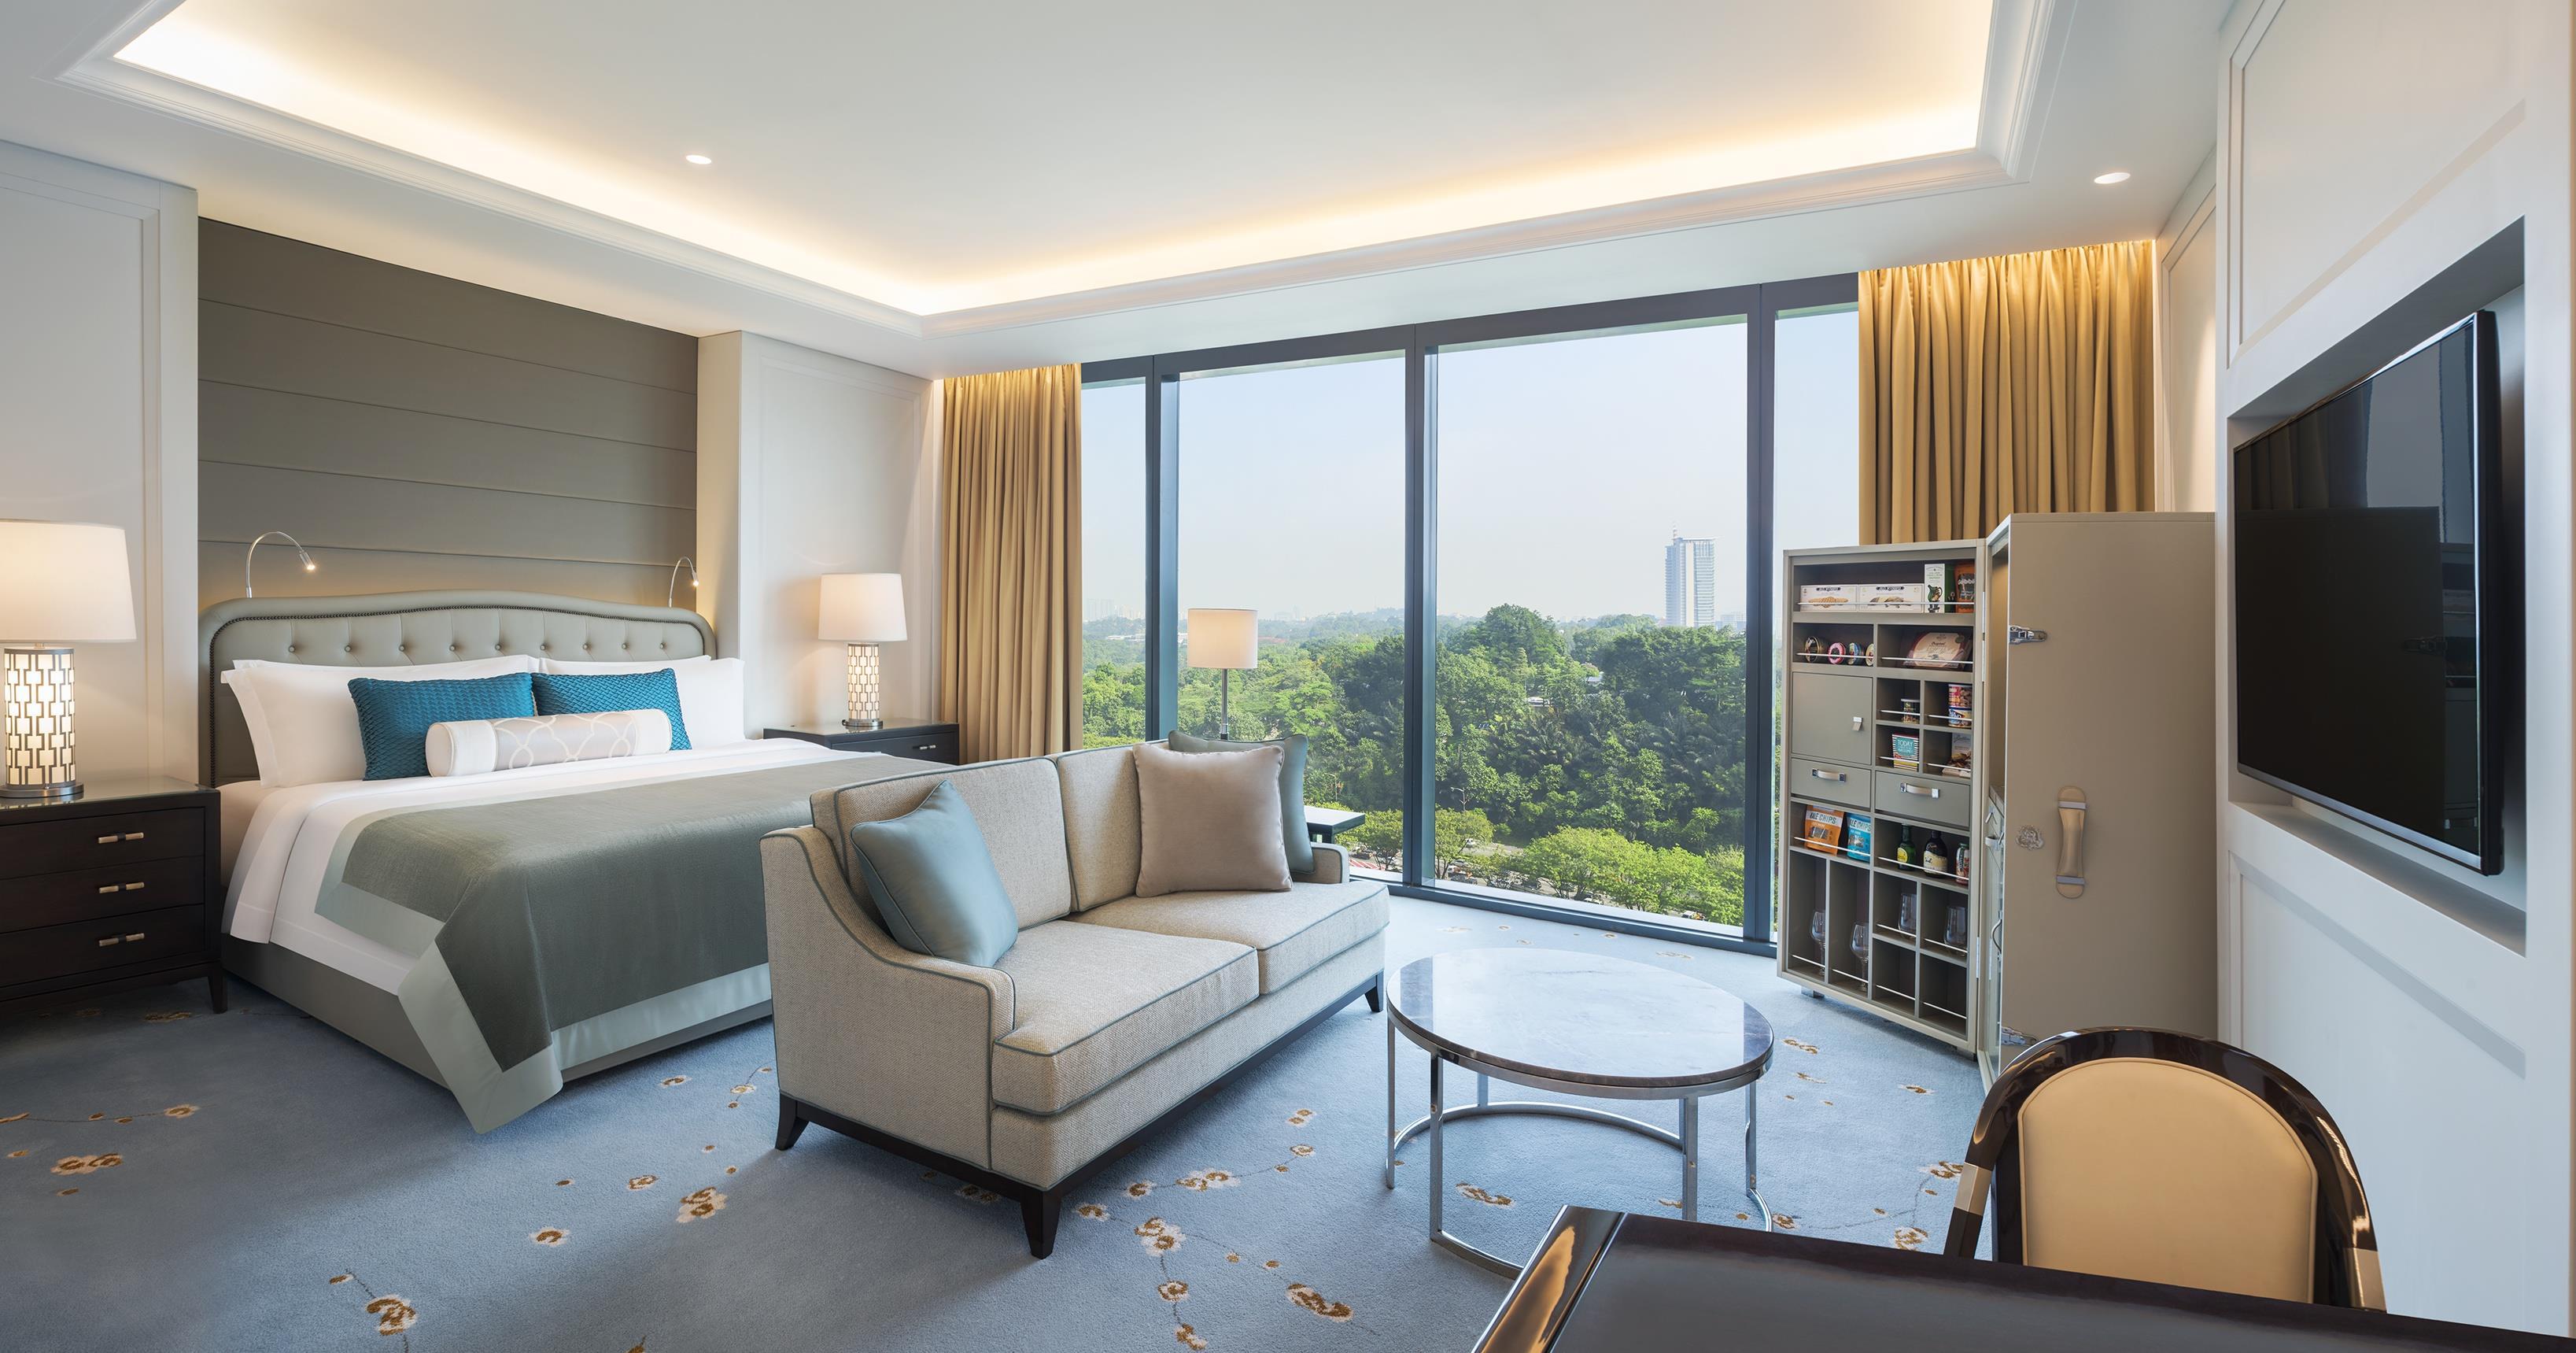 The St. Regis Kuala Lumpur